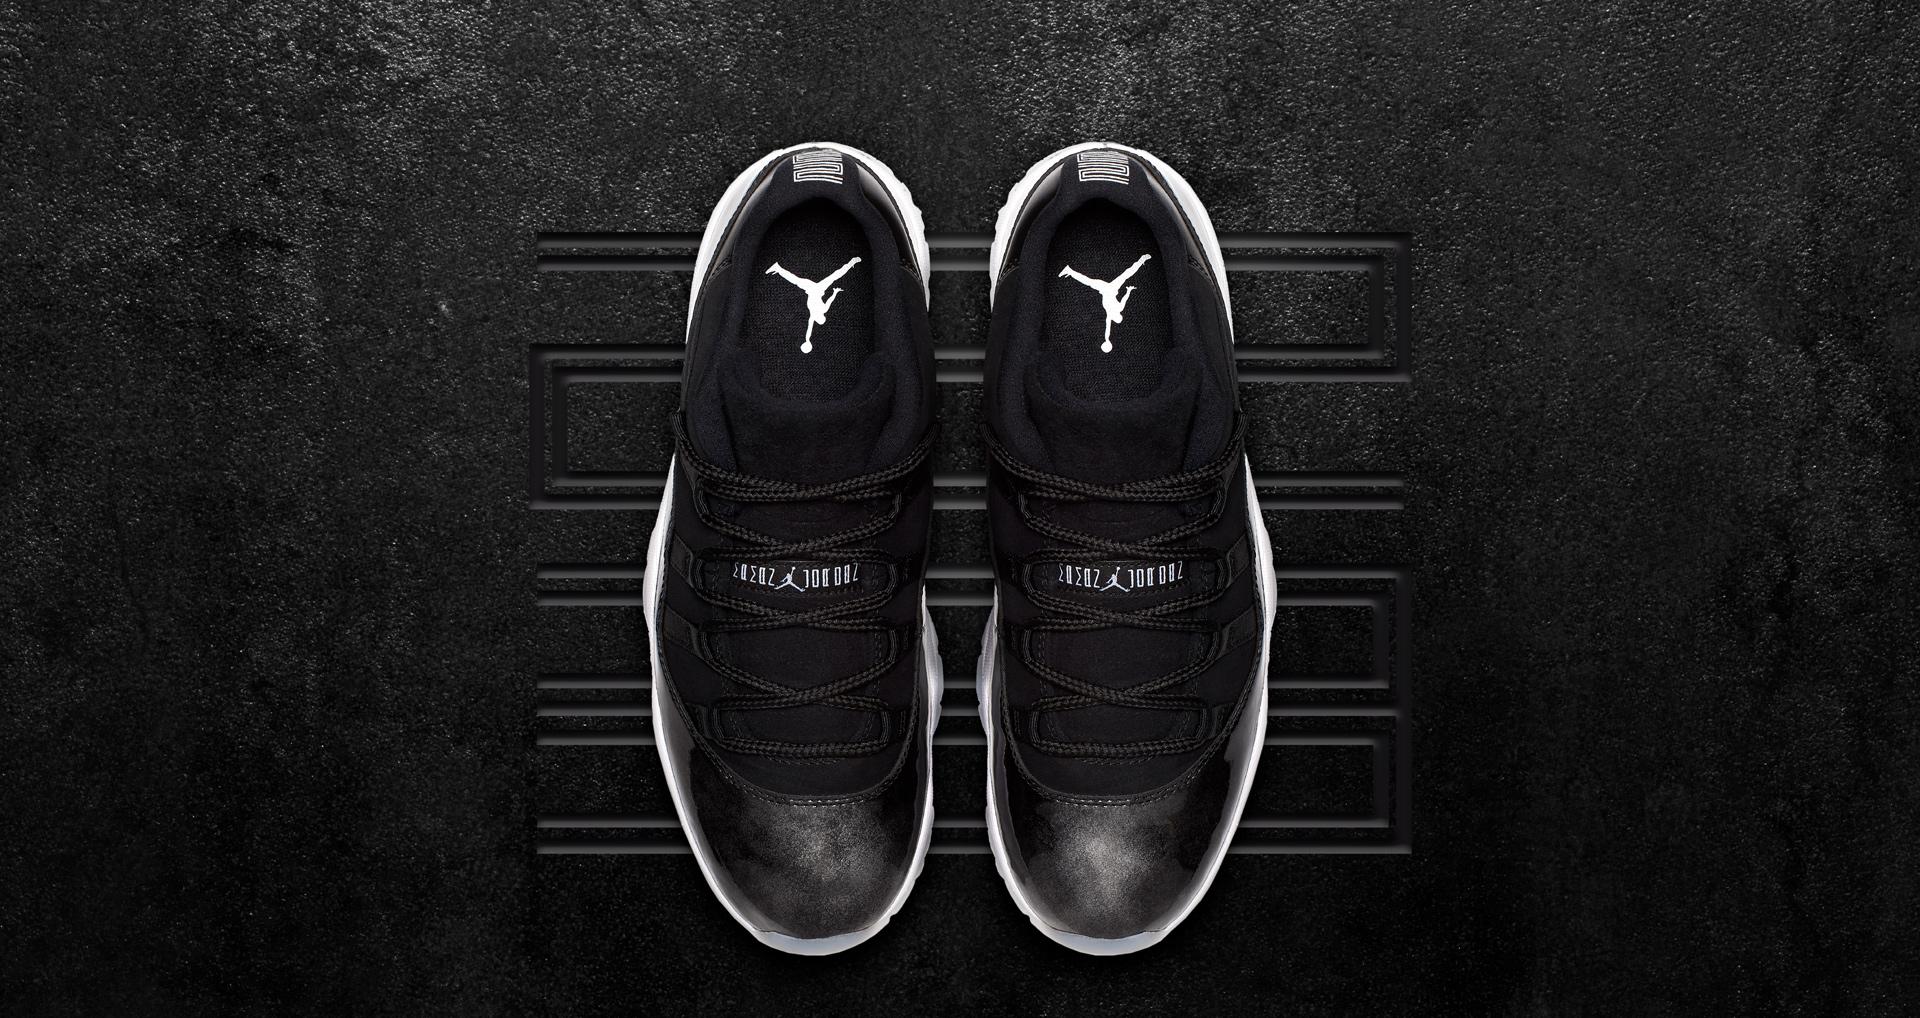 Get a Close Look at the Air Jordan 11 'Baron'-6